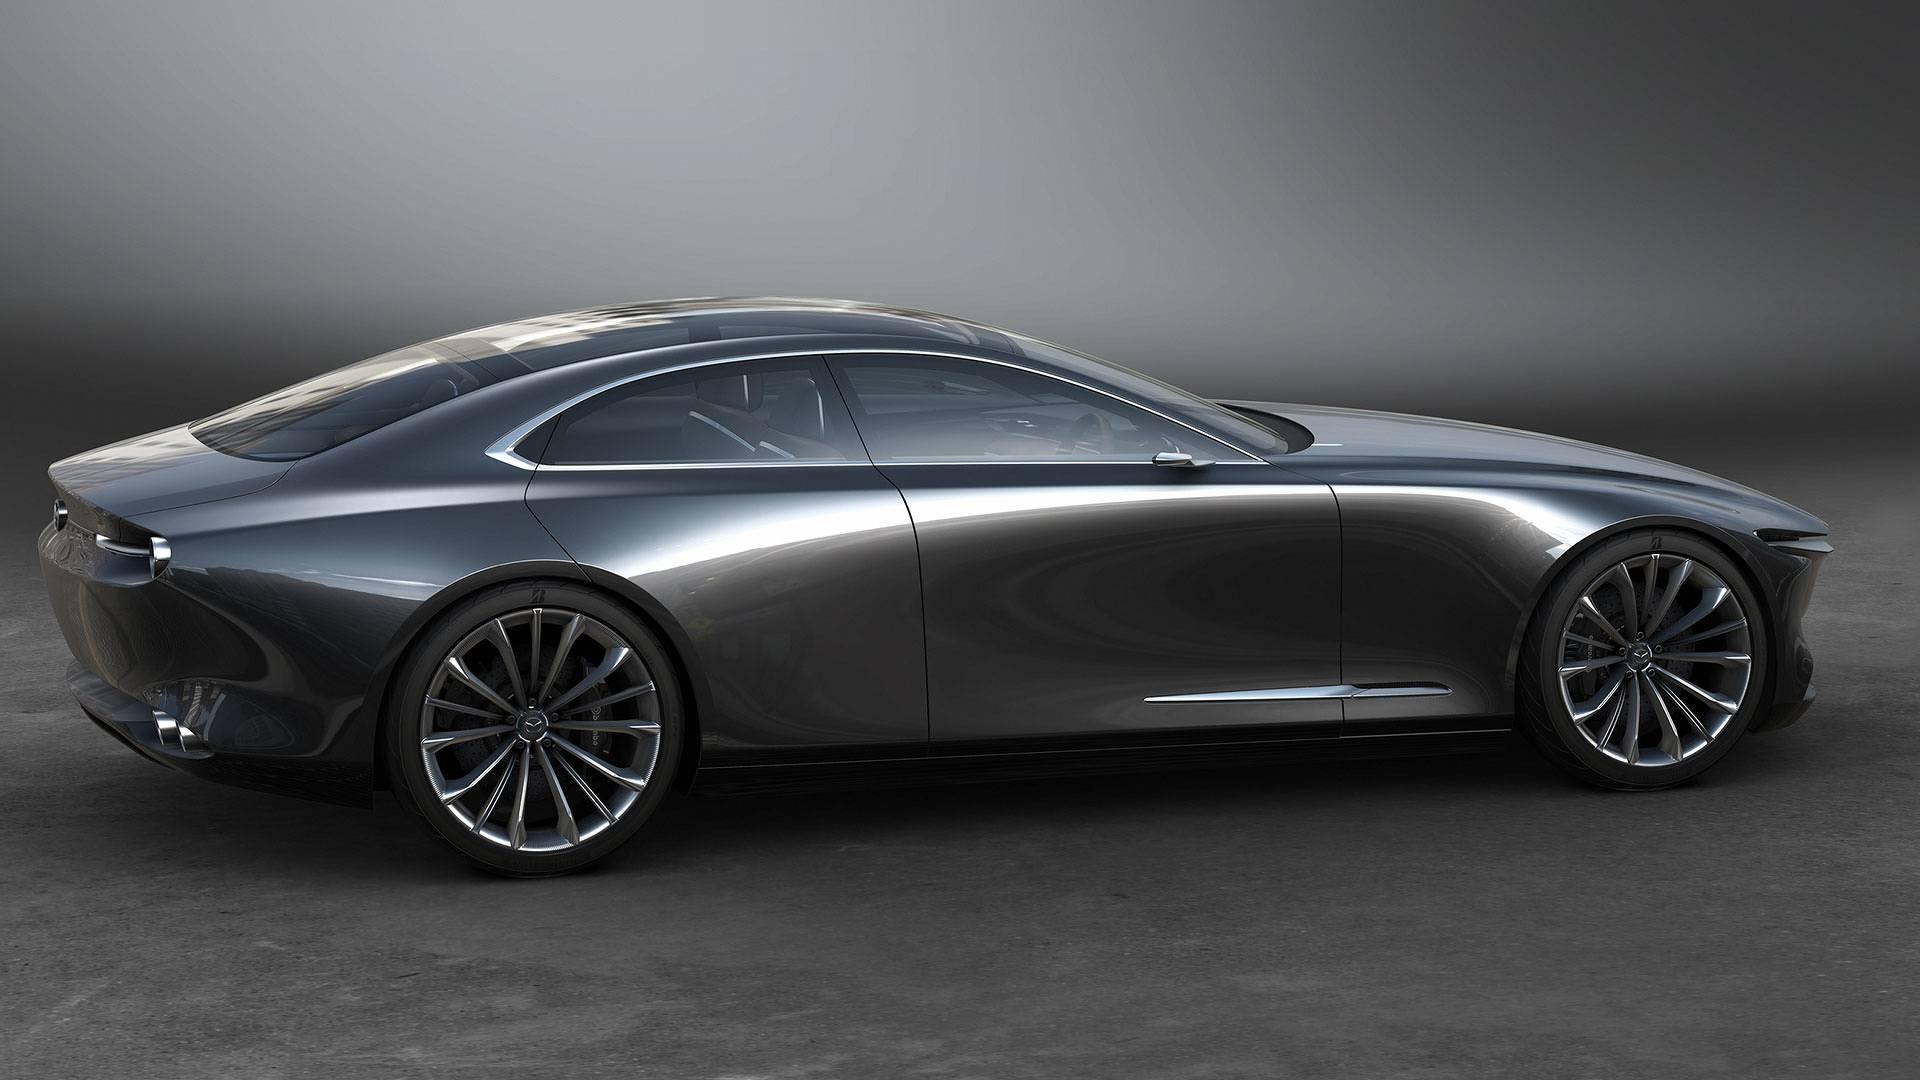 Mazda Vision Coupe Concept Takes Kodo - Soul Of Motion Design To The Next Level - autoevolution